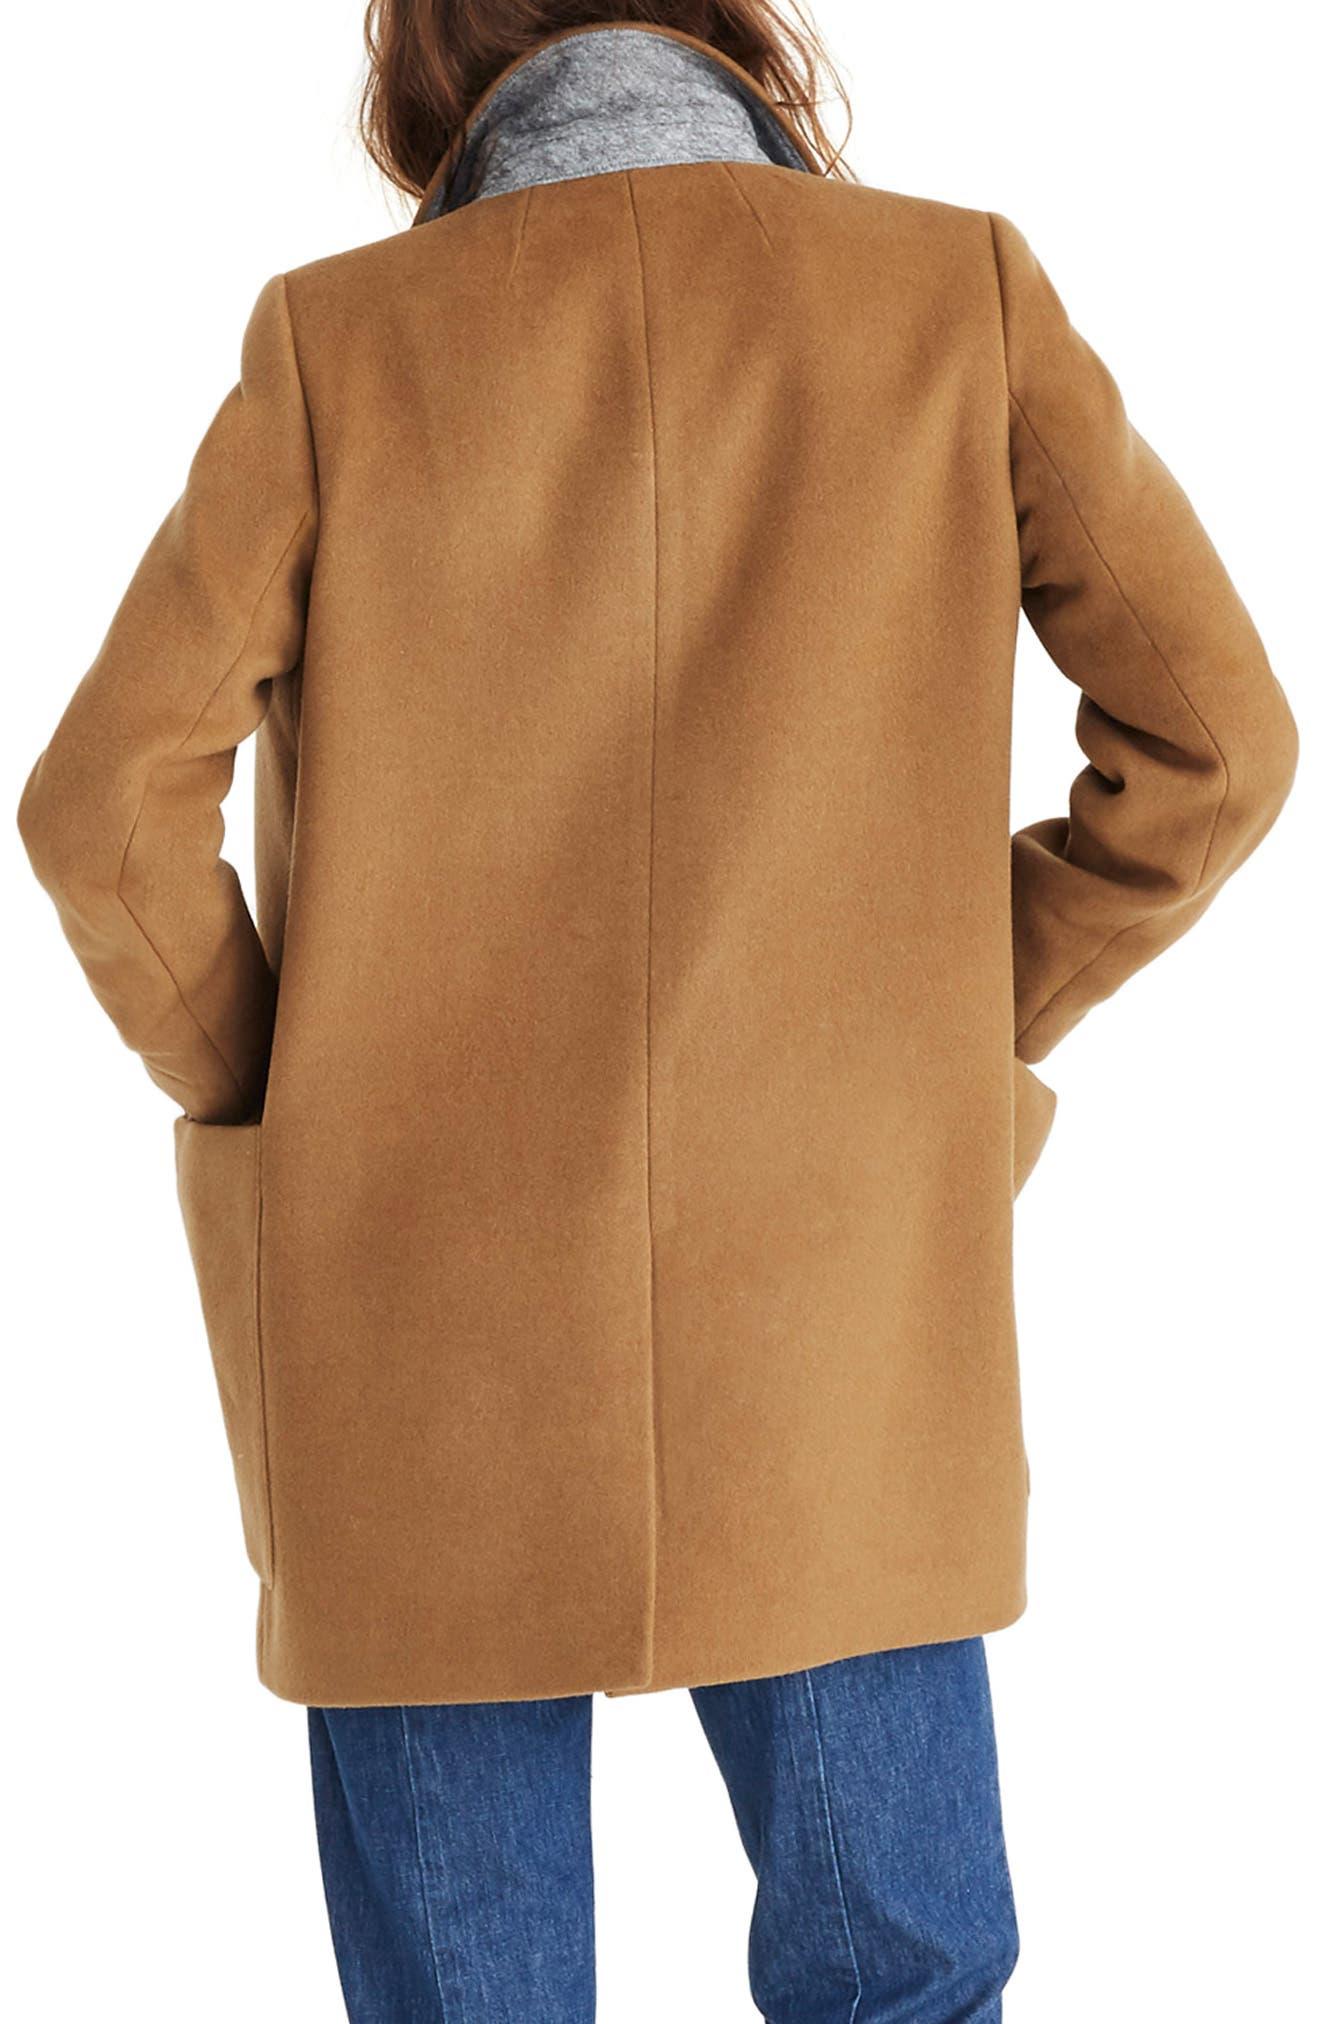 Hollis Double Breasted Coat,                             Alternate thumbnail 2, color,                             CLASSIC DESERT